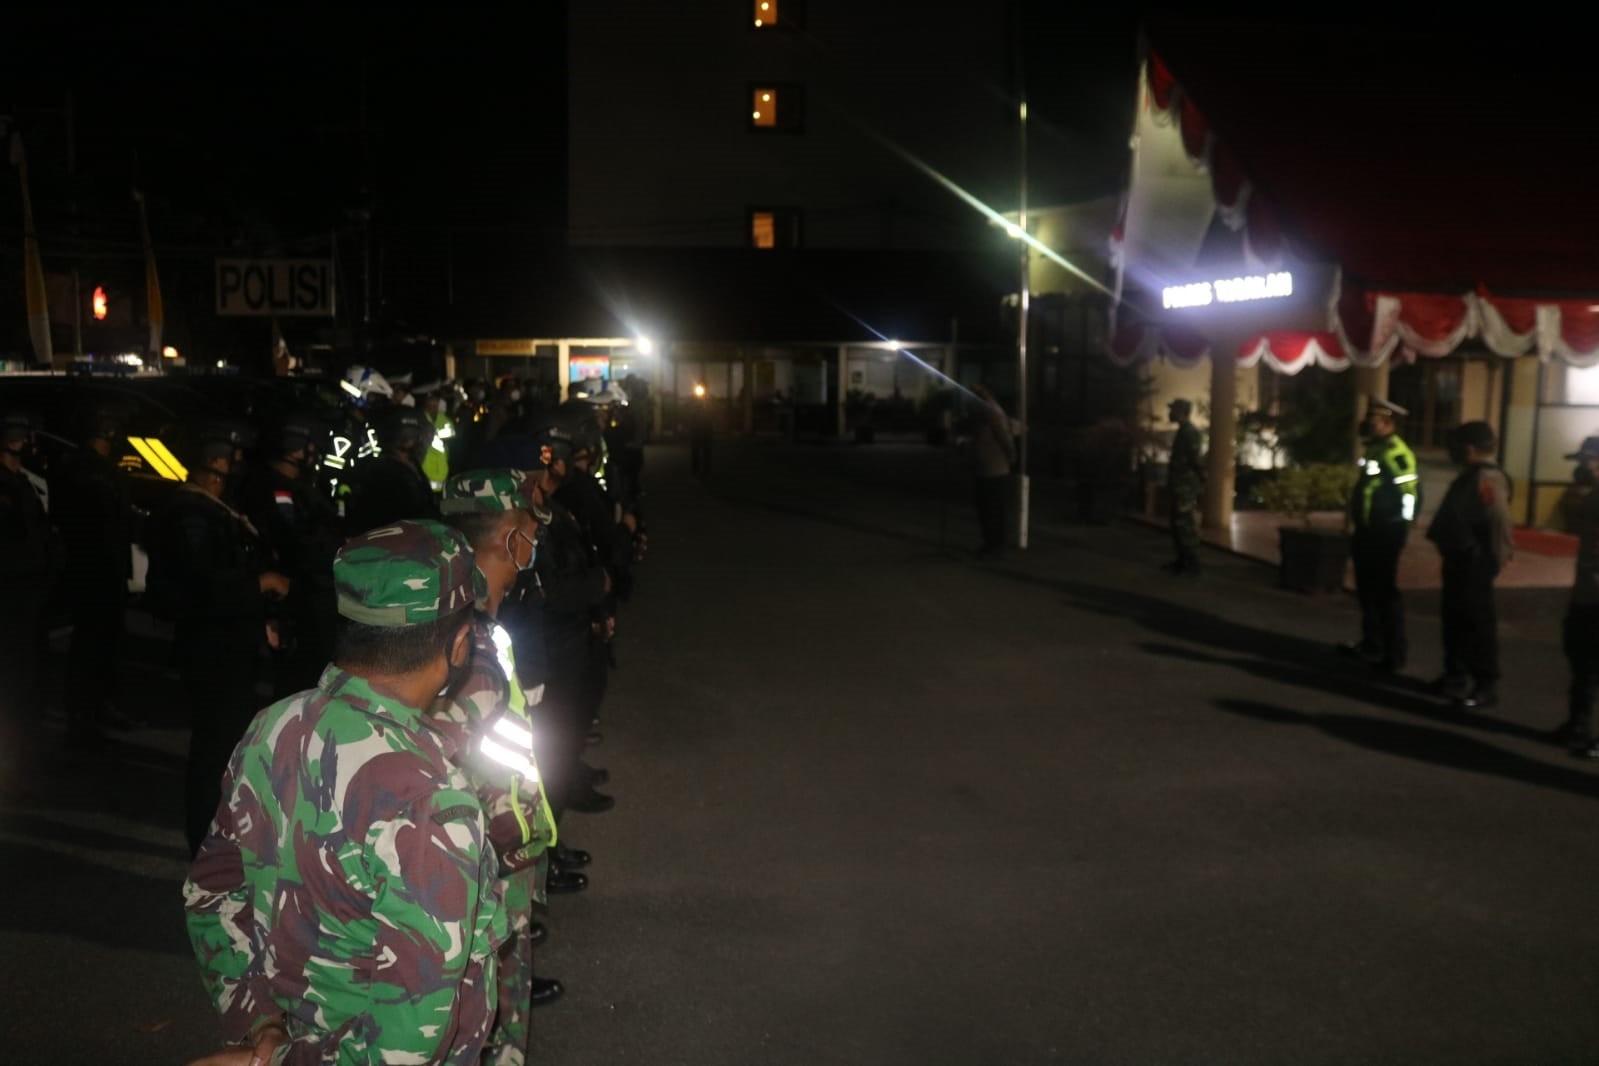 Himbau Masyarakat,Dandim dan Kapolres Tarakan Pimpin Patroli Prokes Skala Besar.